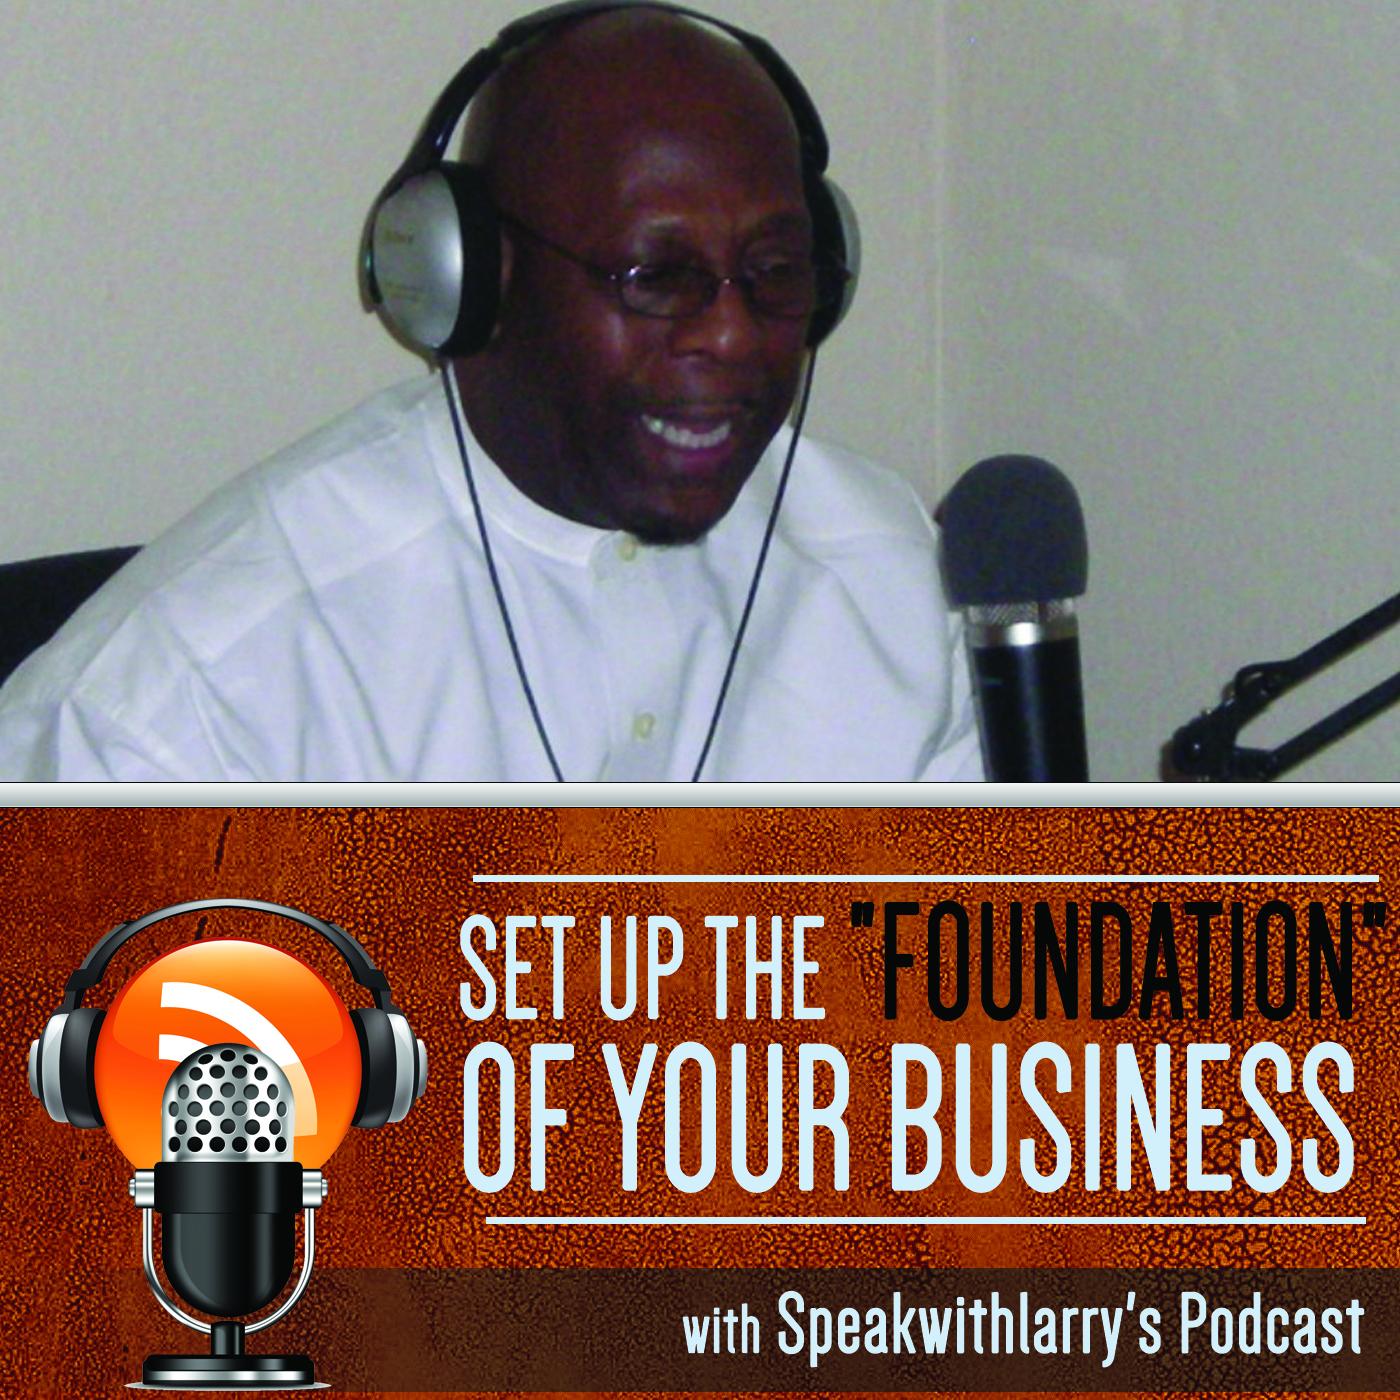 Speakwithlarrys Podcast show art